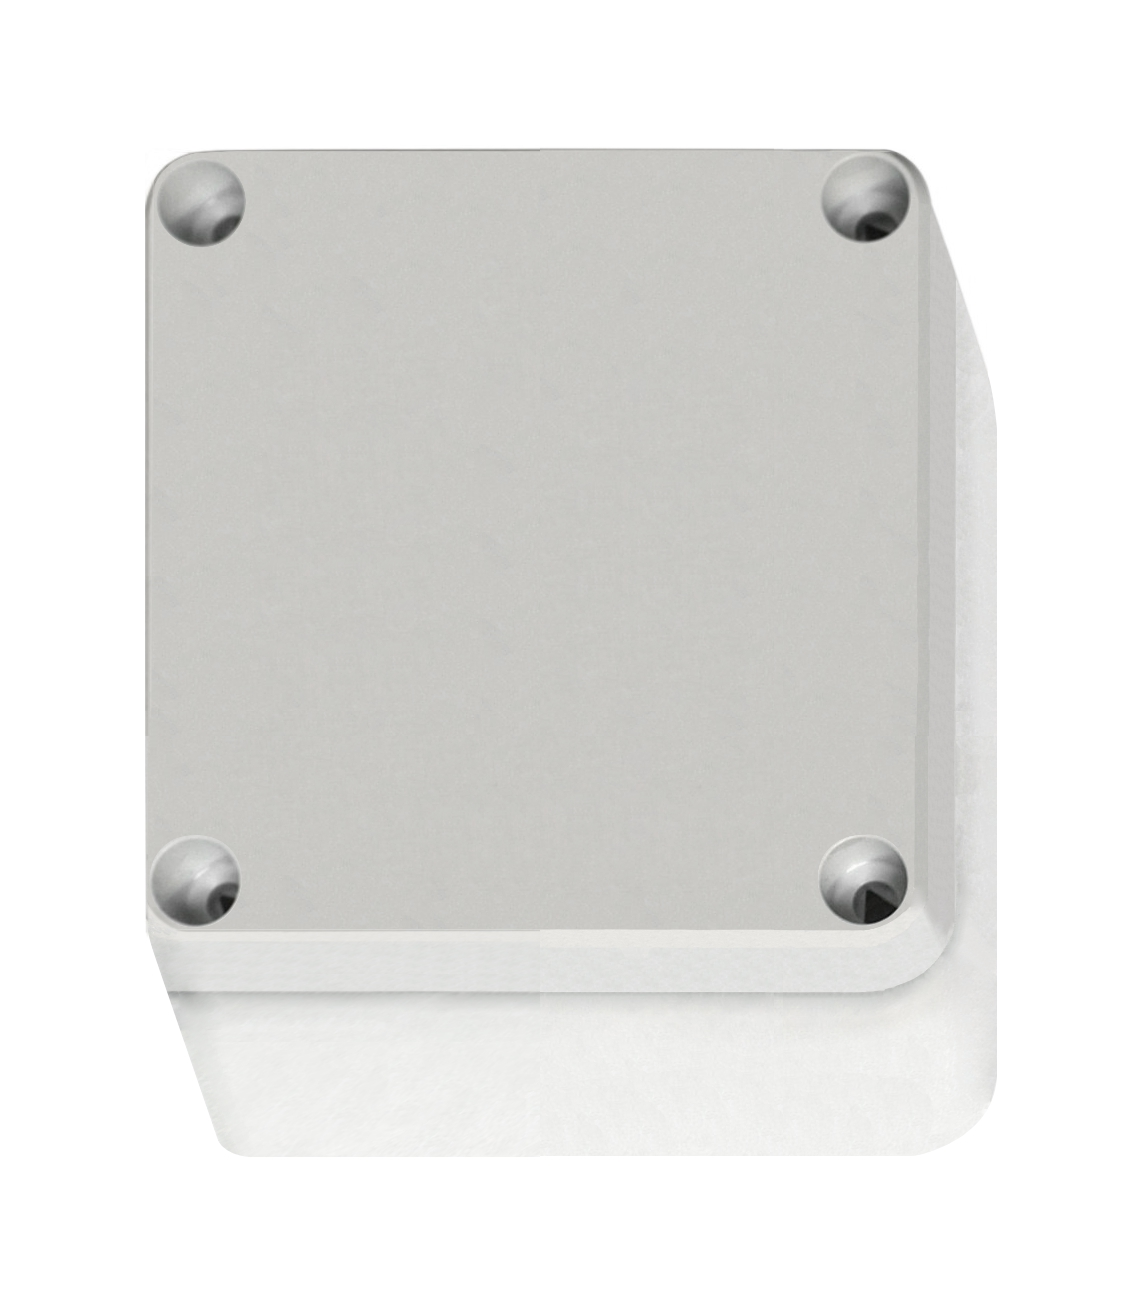 1 Stk ABS Gehäuse+Deckel grau m. Scharnier, 110x110x65mm, RAL7035 IG707001--